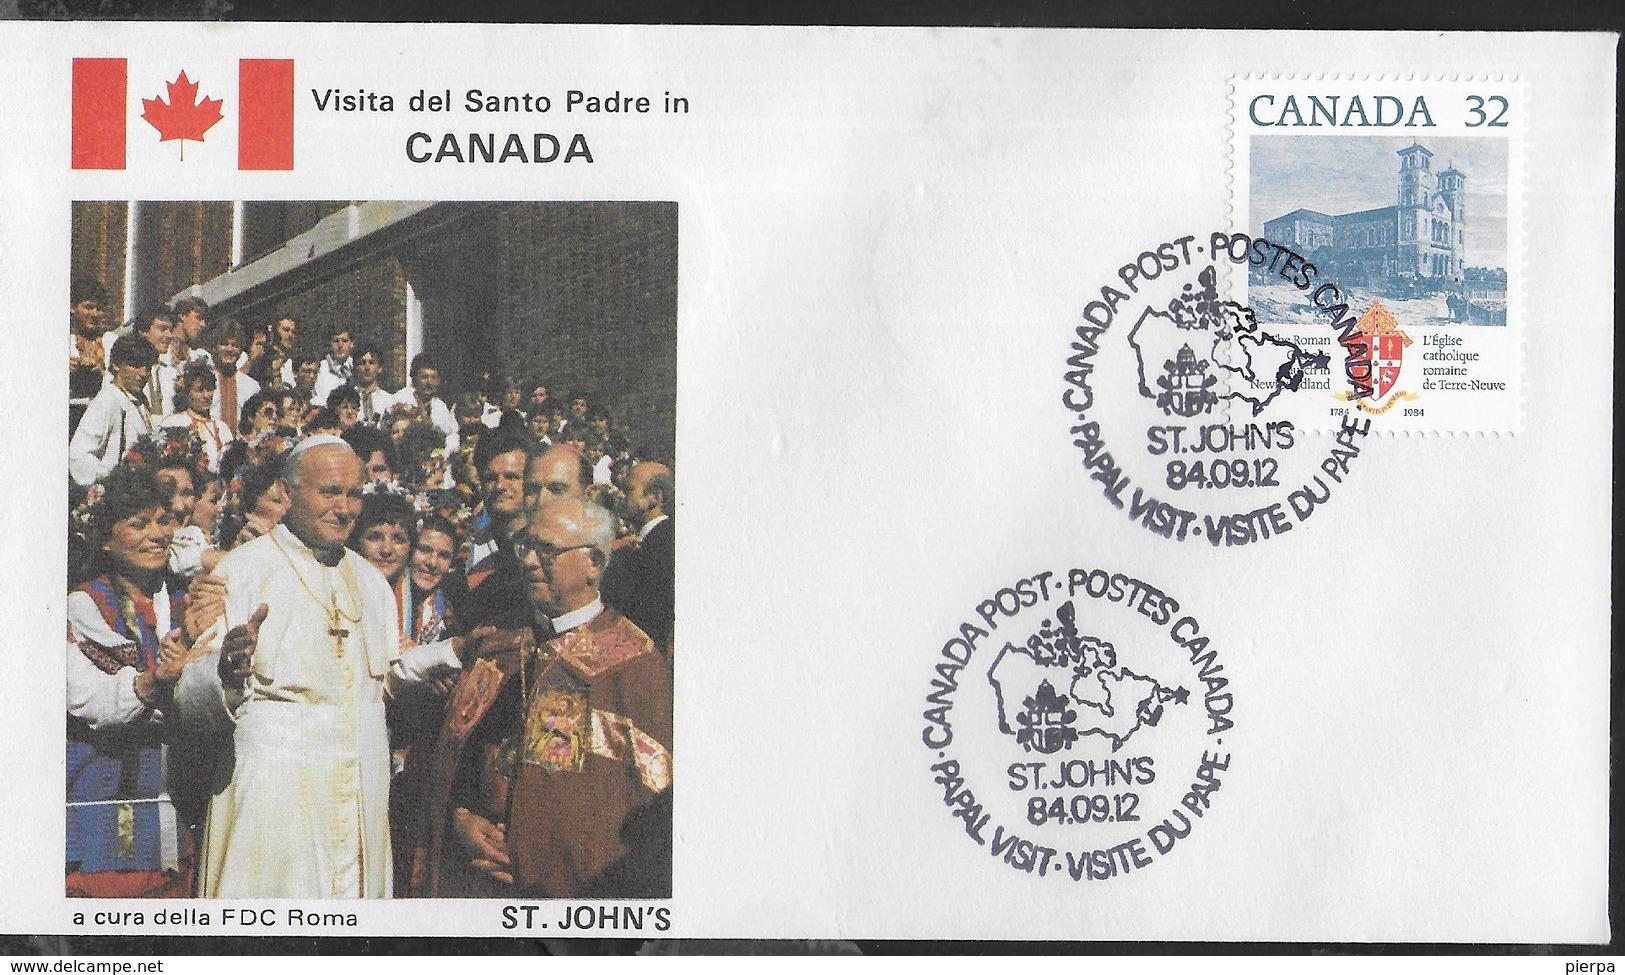 PAPAL VISIT - VISIT DU PAPE - 12.09.1984 - ANNULLO SPECIALE ST.JOHNS - Primi Giorni (FDC)